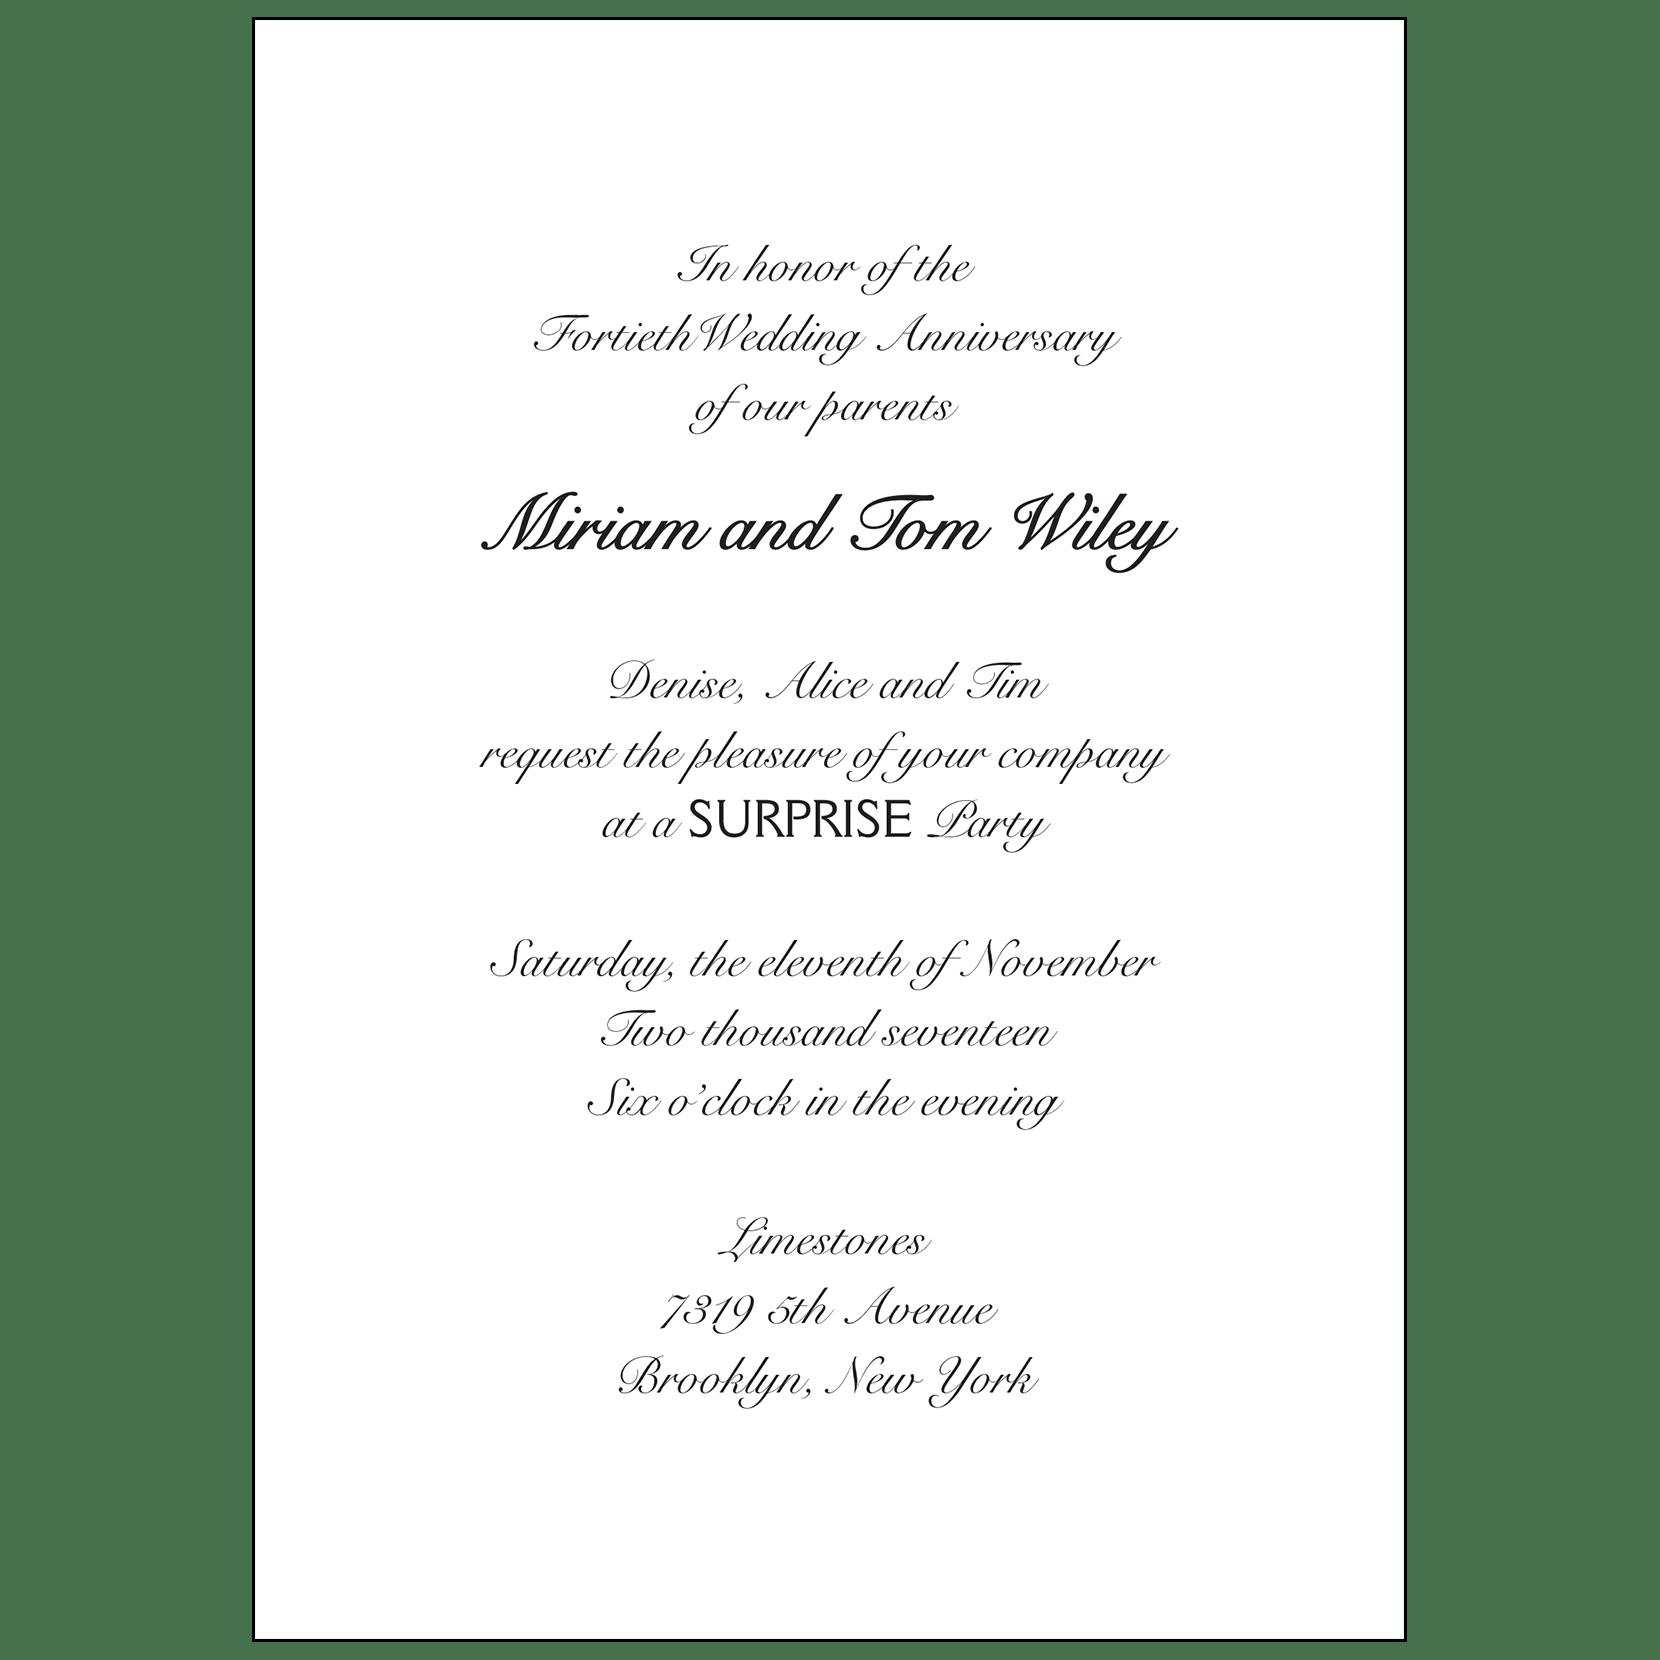 40th Wedding Anniversary Party Invitation, Style 1B – IPV Studio